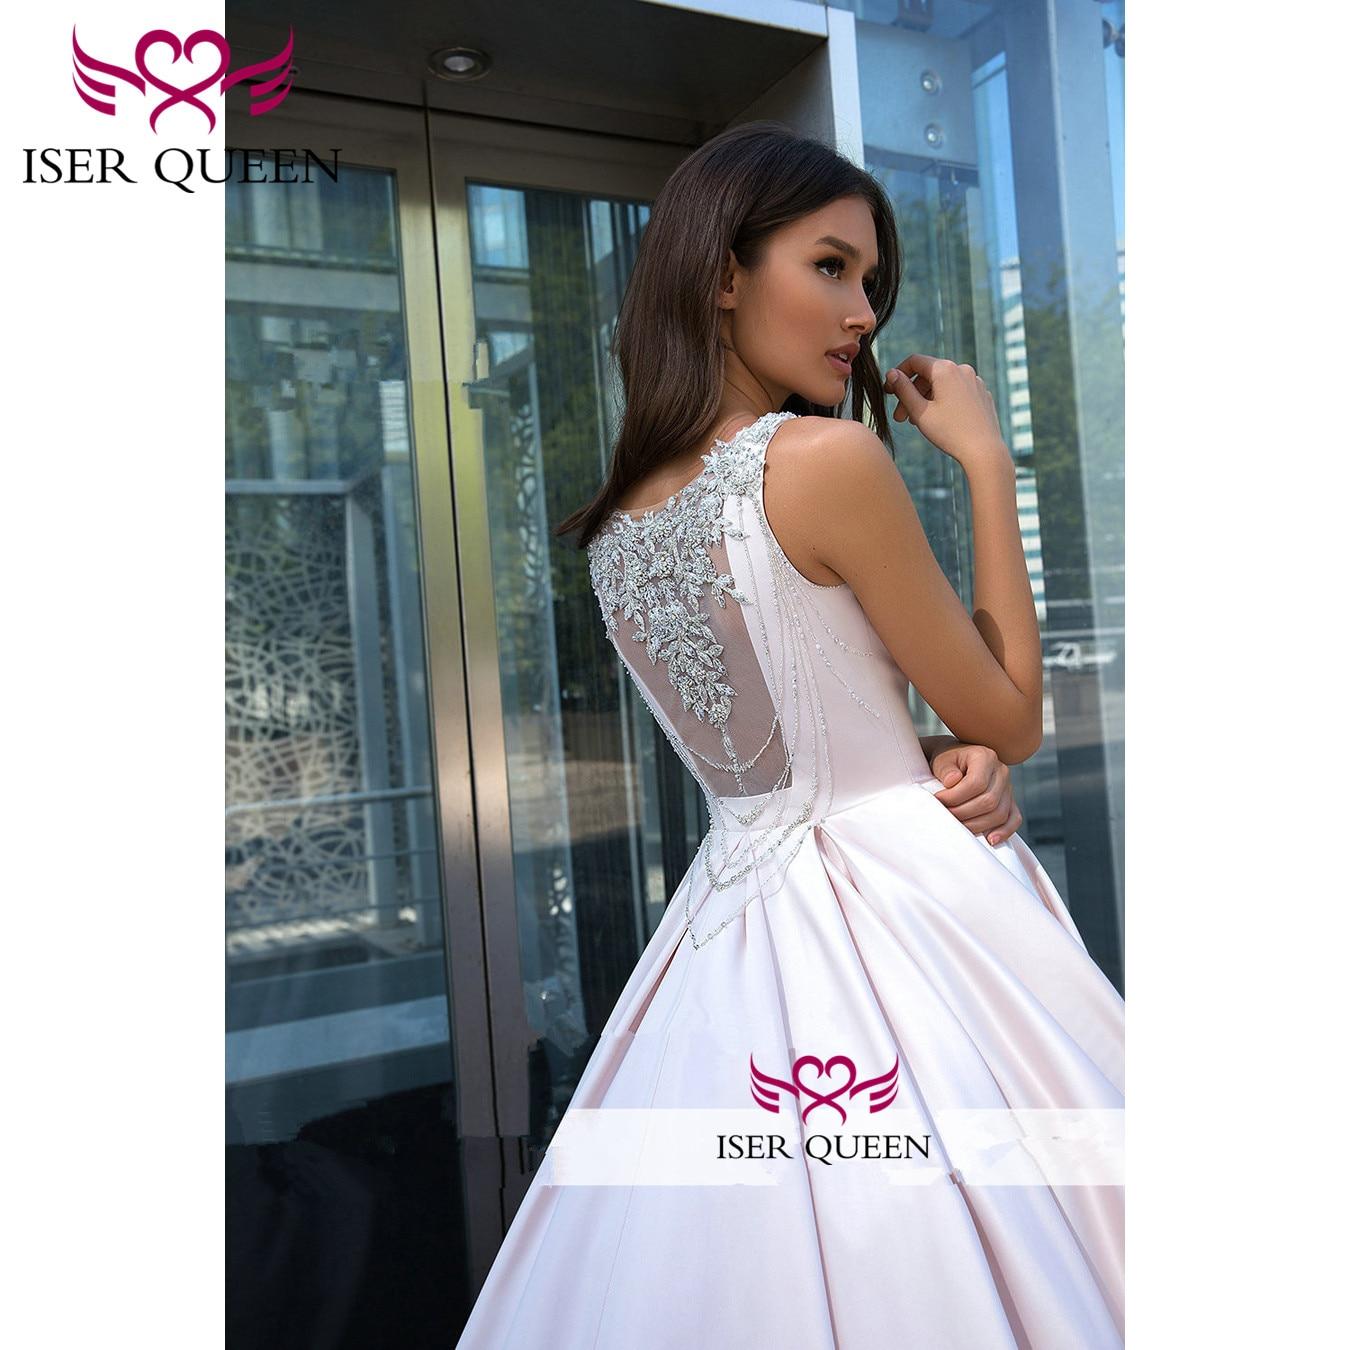 Perles cristal dos conception d'illusion brillant Satin robe De mariée froncé élégant Simple Vestido De Novia Princesa w0553